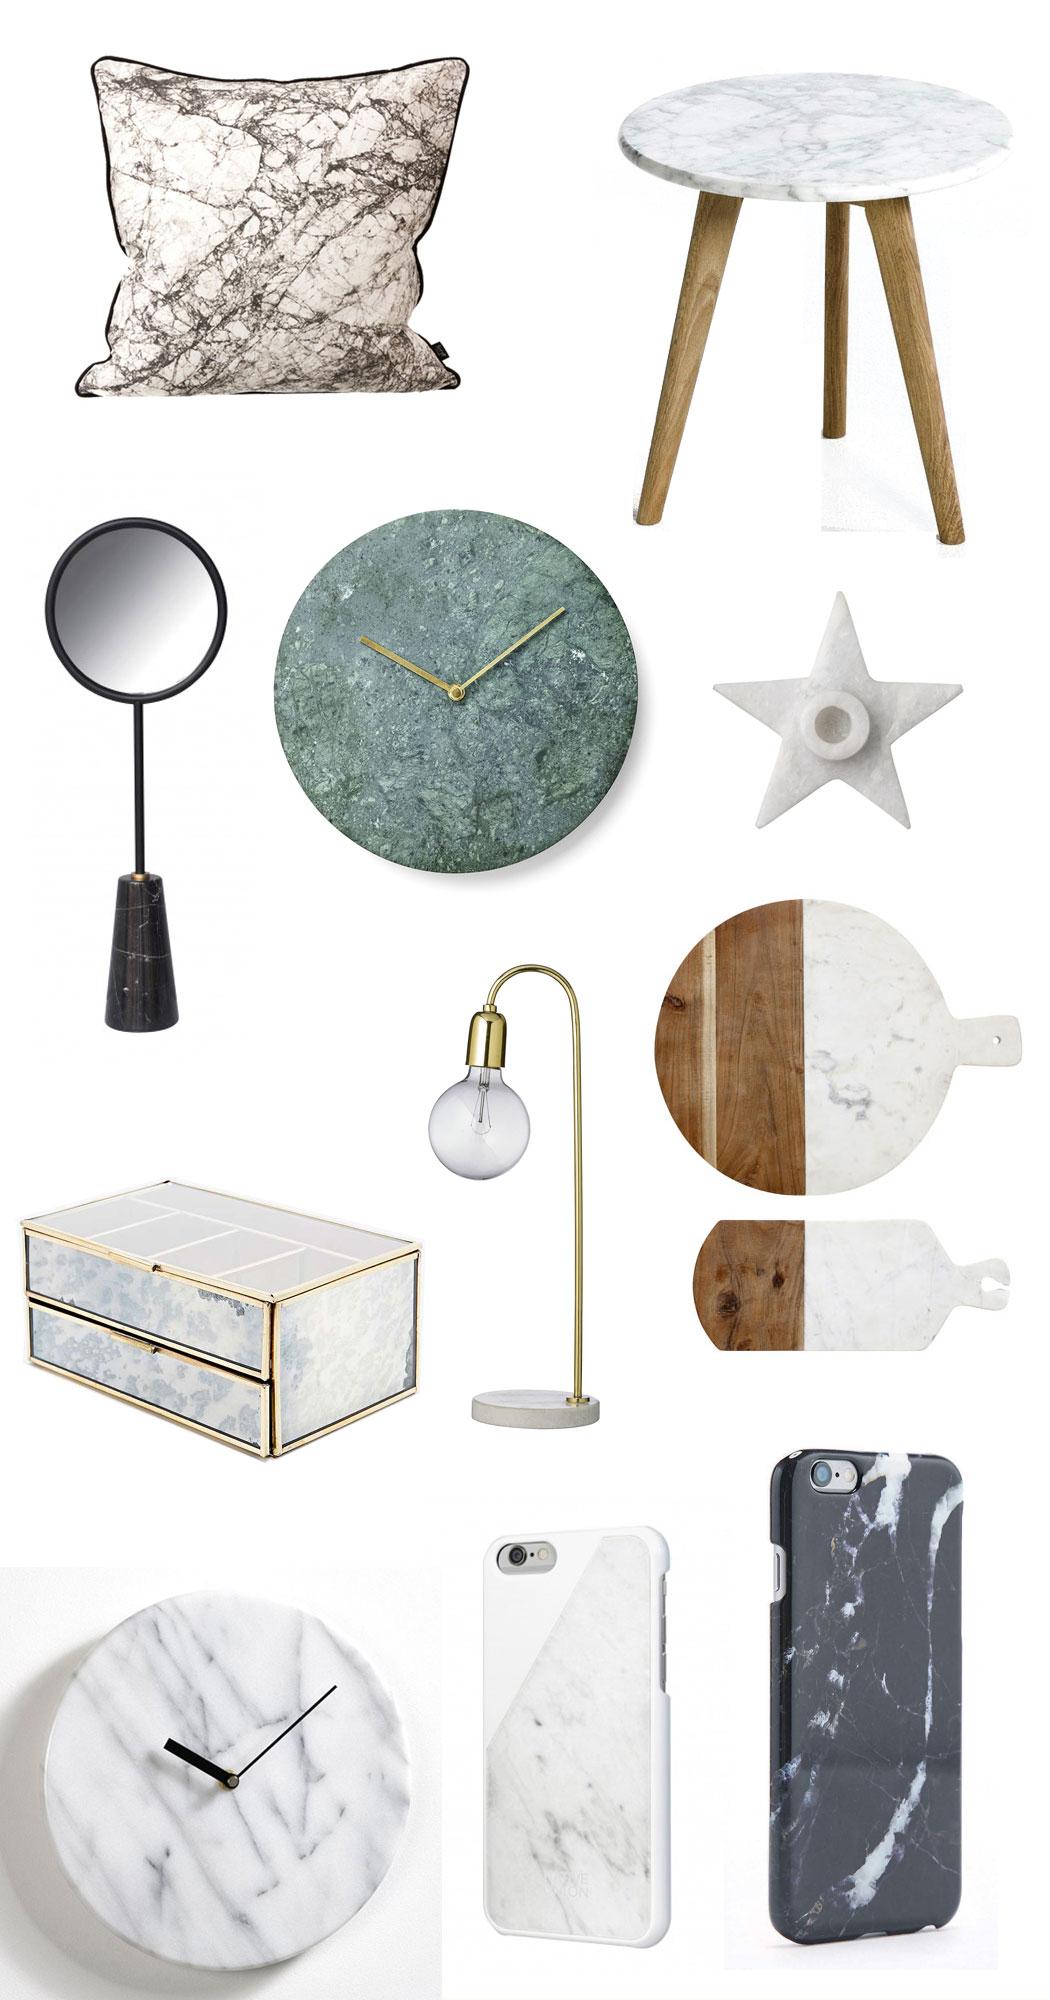 Shopping 11 objets compl tement marbr s - Marbres design ...